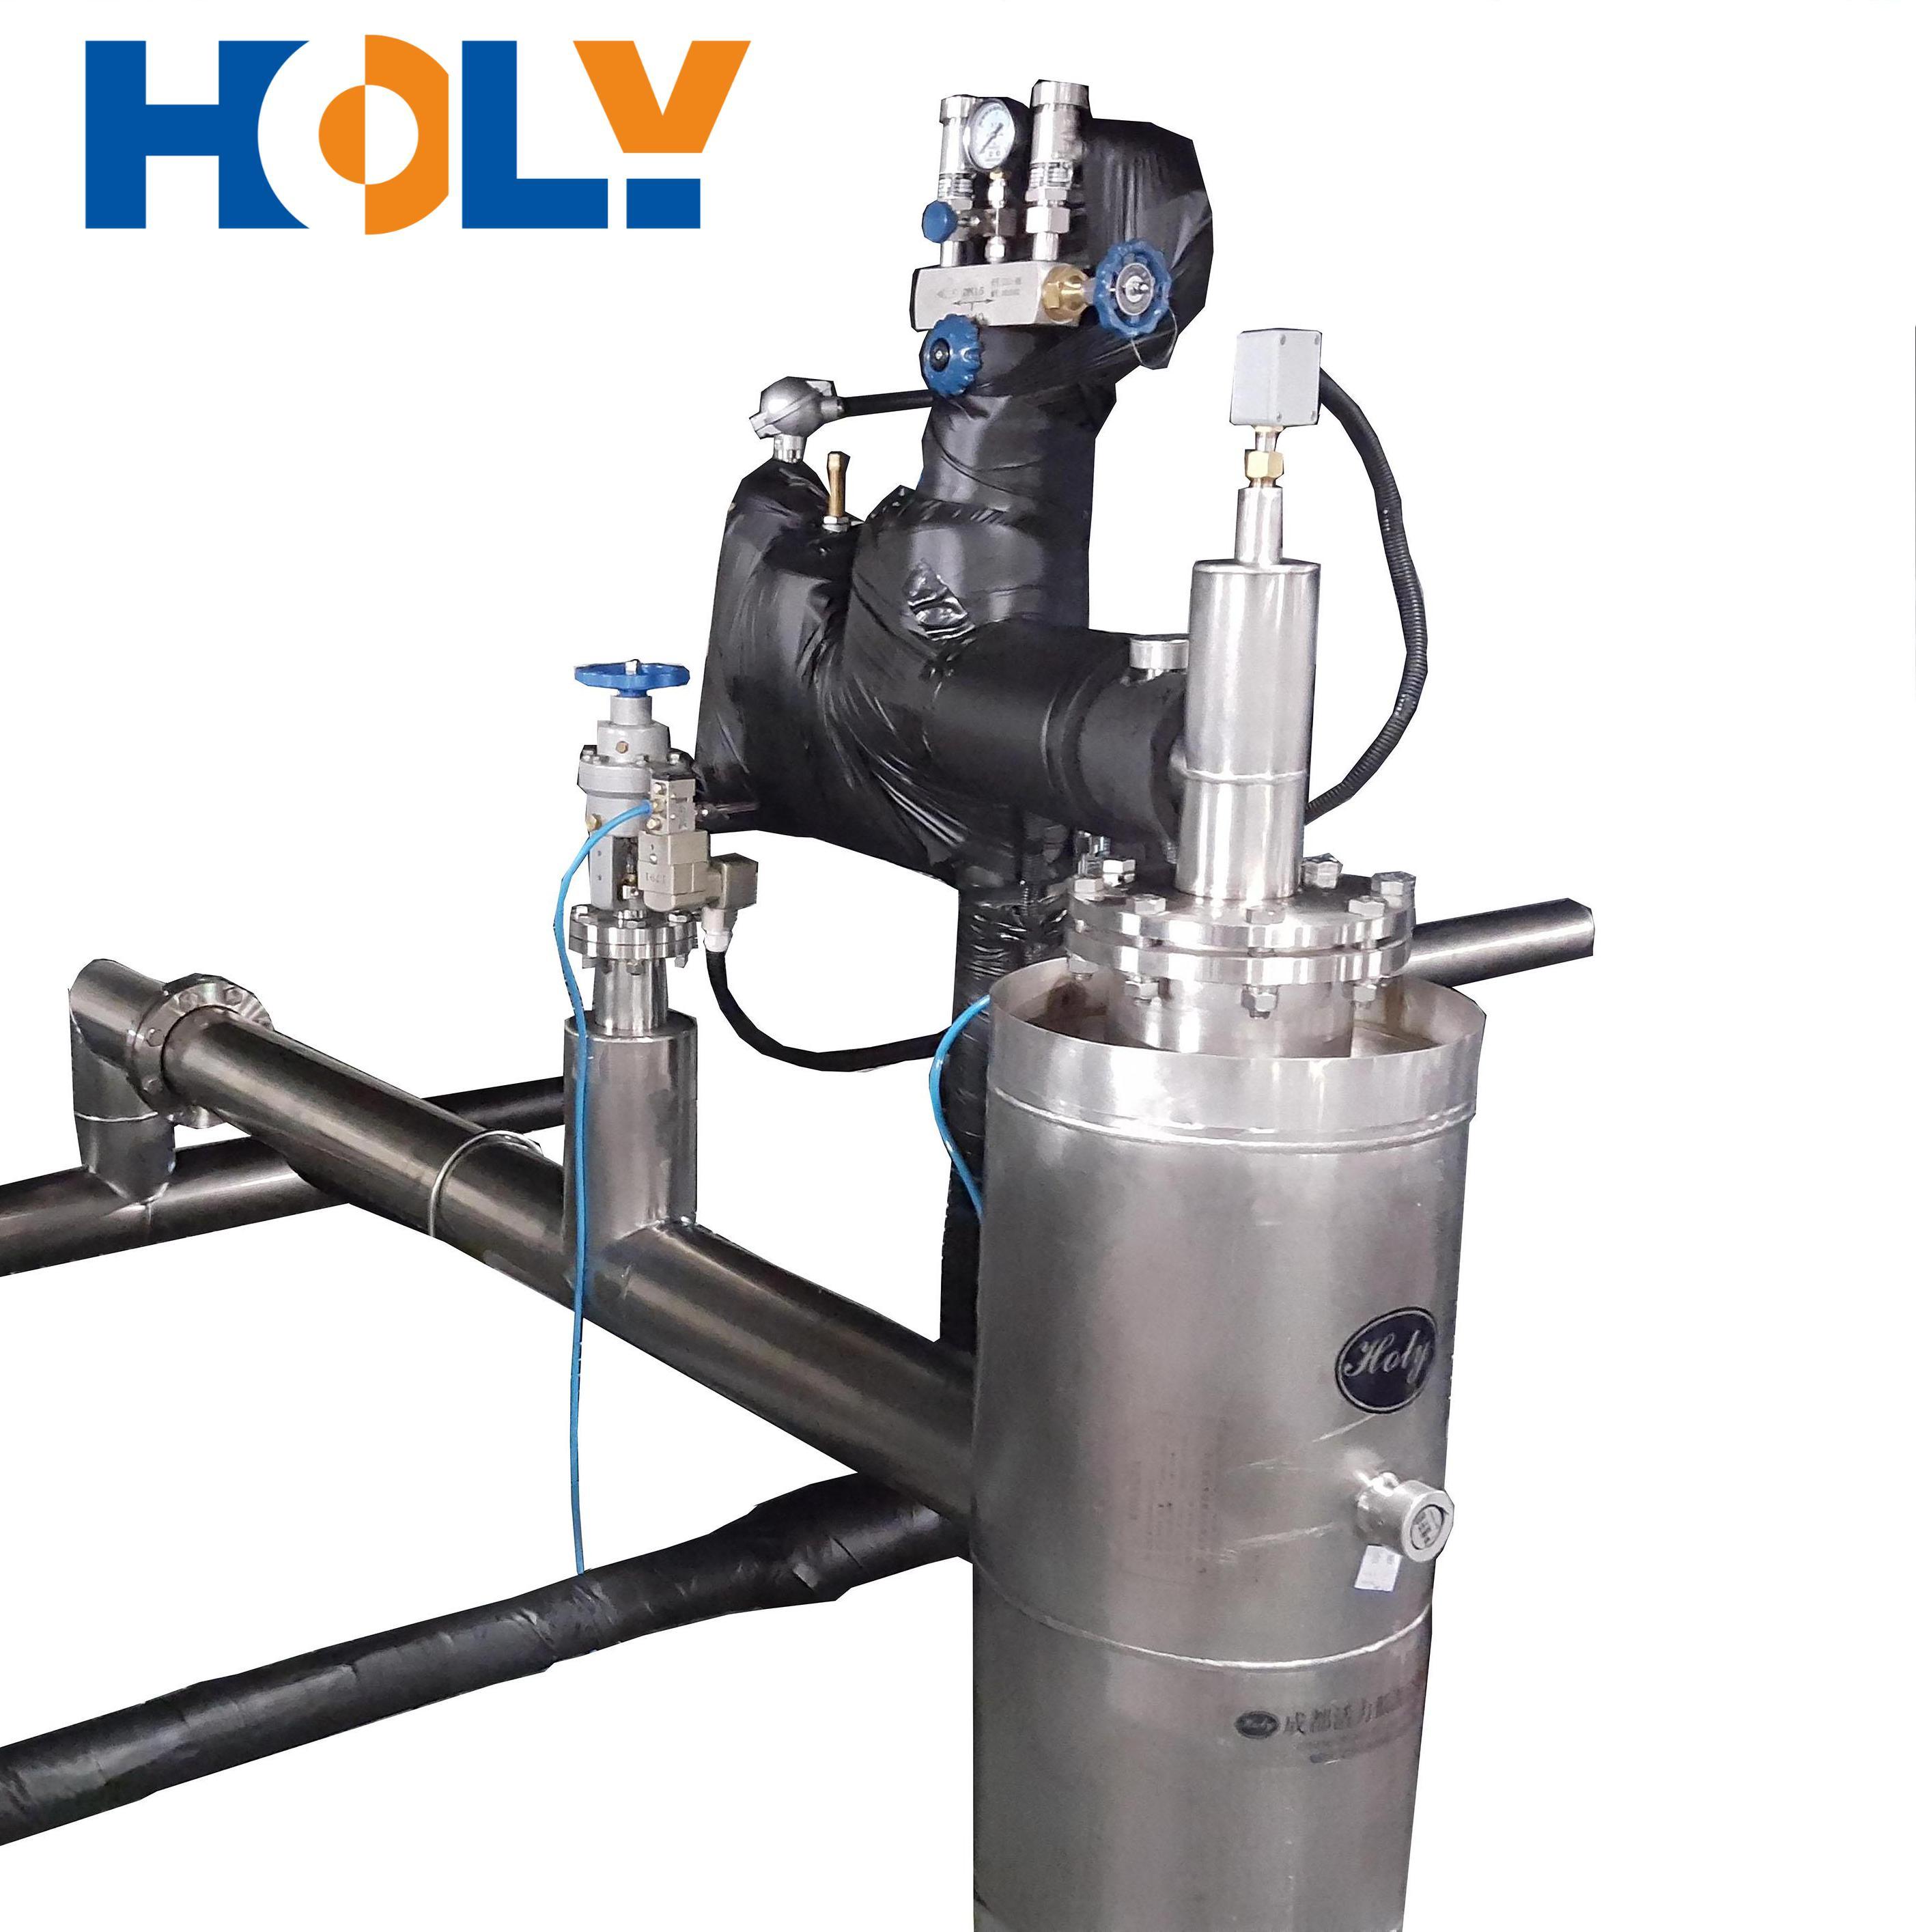 Pressure Regulating Phase Separator of Vacuum Jacketed pipe System for Liquid Nitrogen